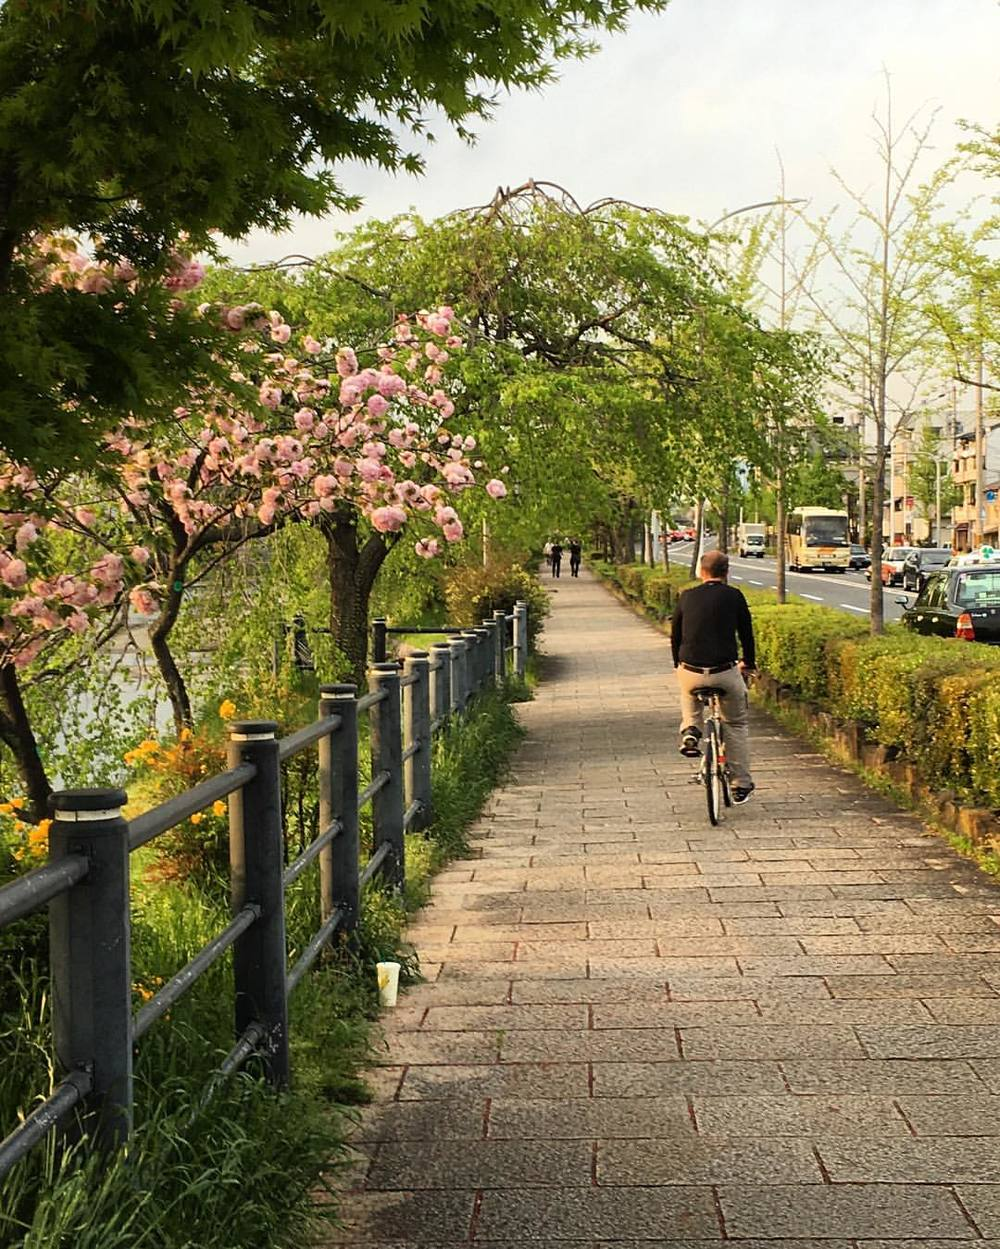 Bicycling along the Kyoto riverside. #travel #bicycling #kyoto #japan #livingthedream #serene #worldtraveler  (at Kiyomizu-Gojō Station)